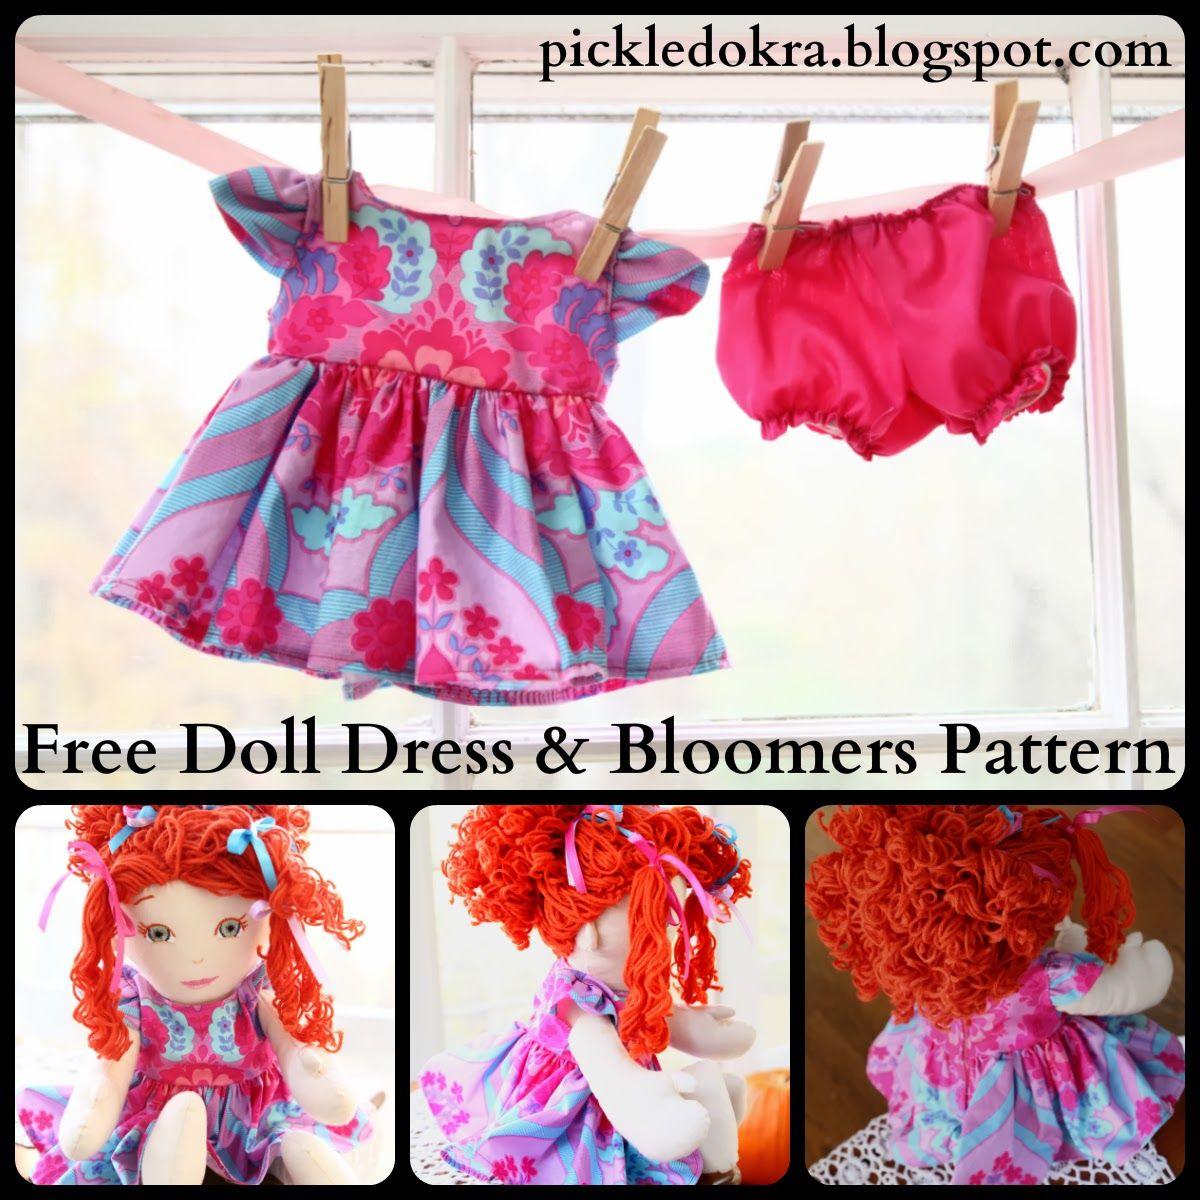 Blythe's Doll, Free Dress Pattern (Pickled Okra:) #dollunderware